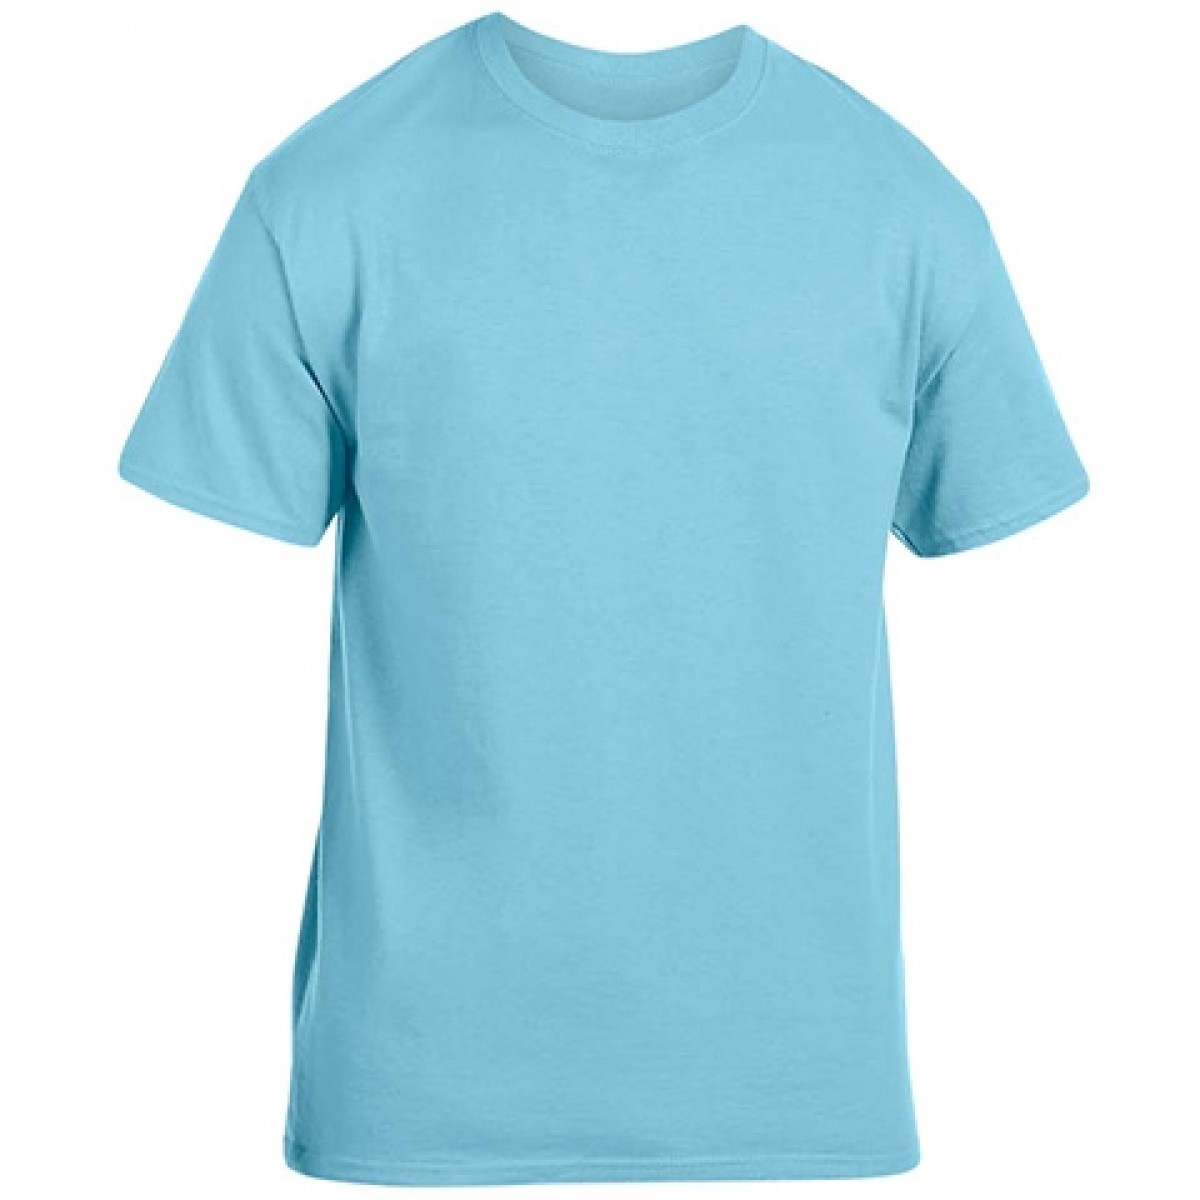 Soft 100% Cotton T-Shirt-Sky Blue-YL